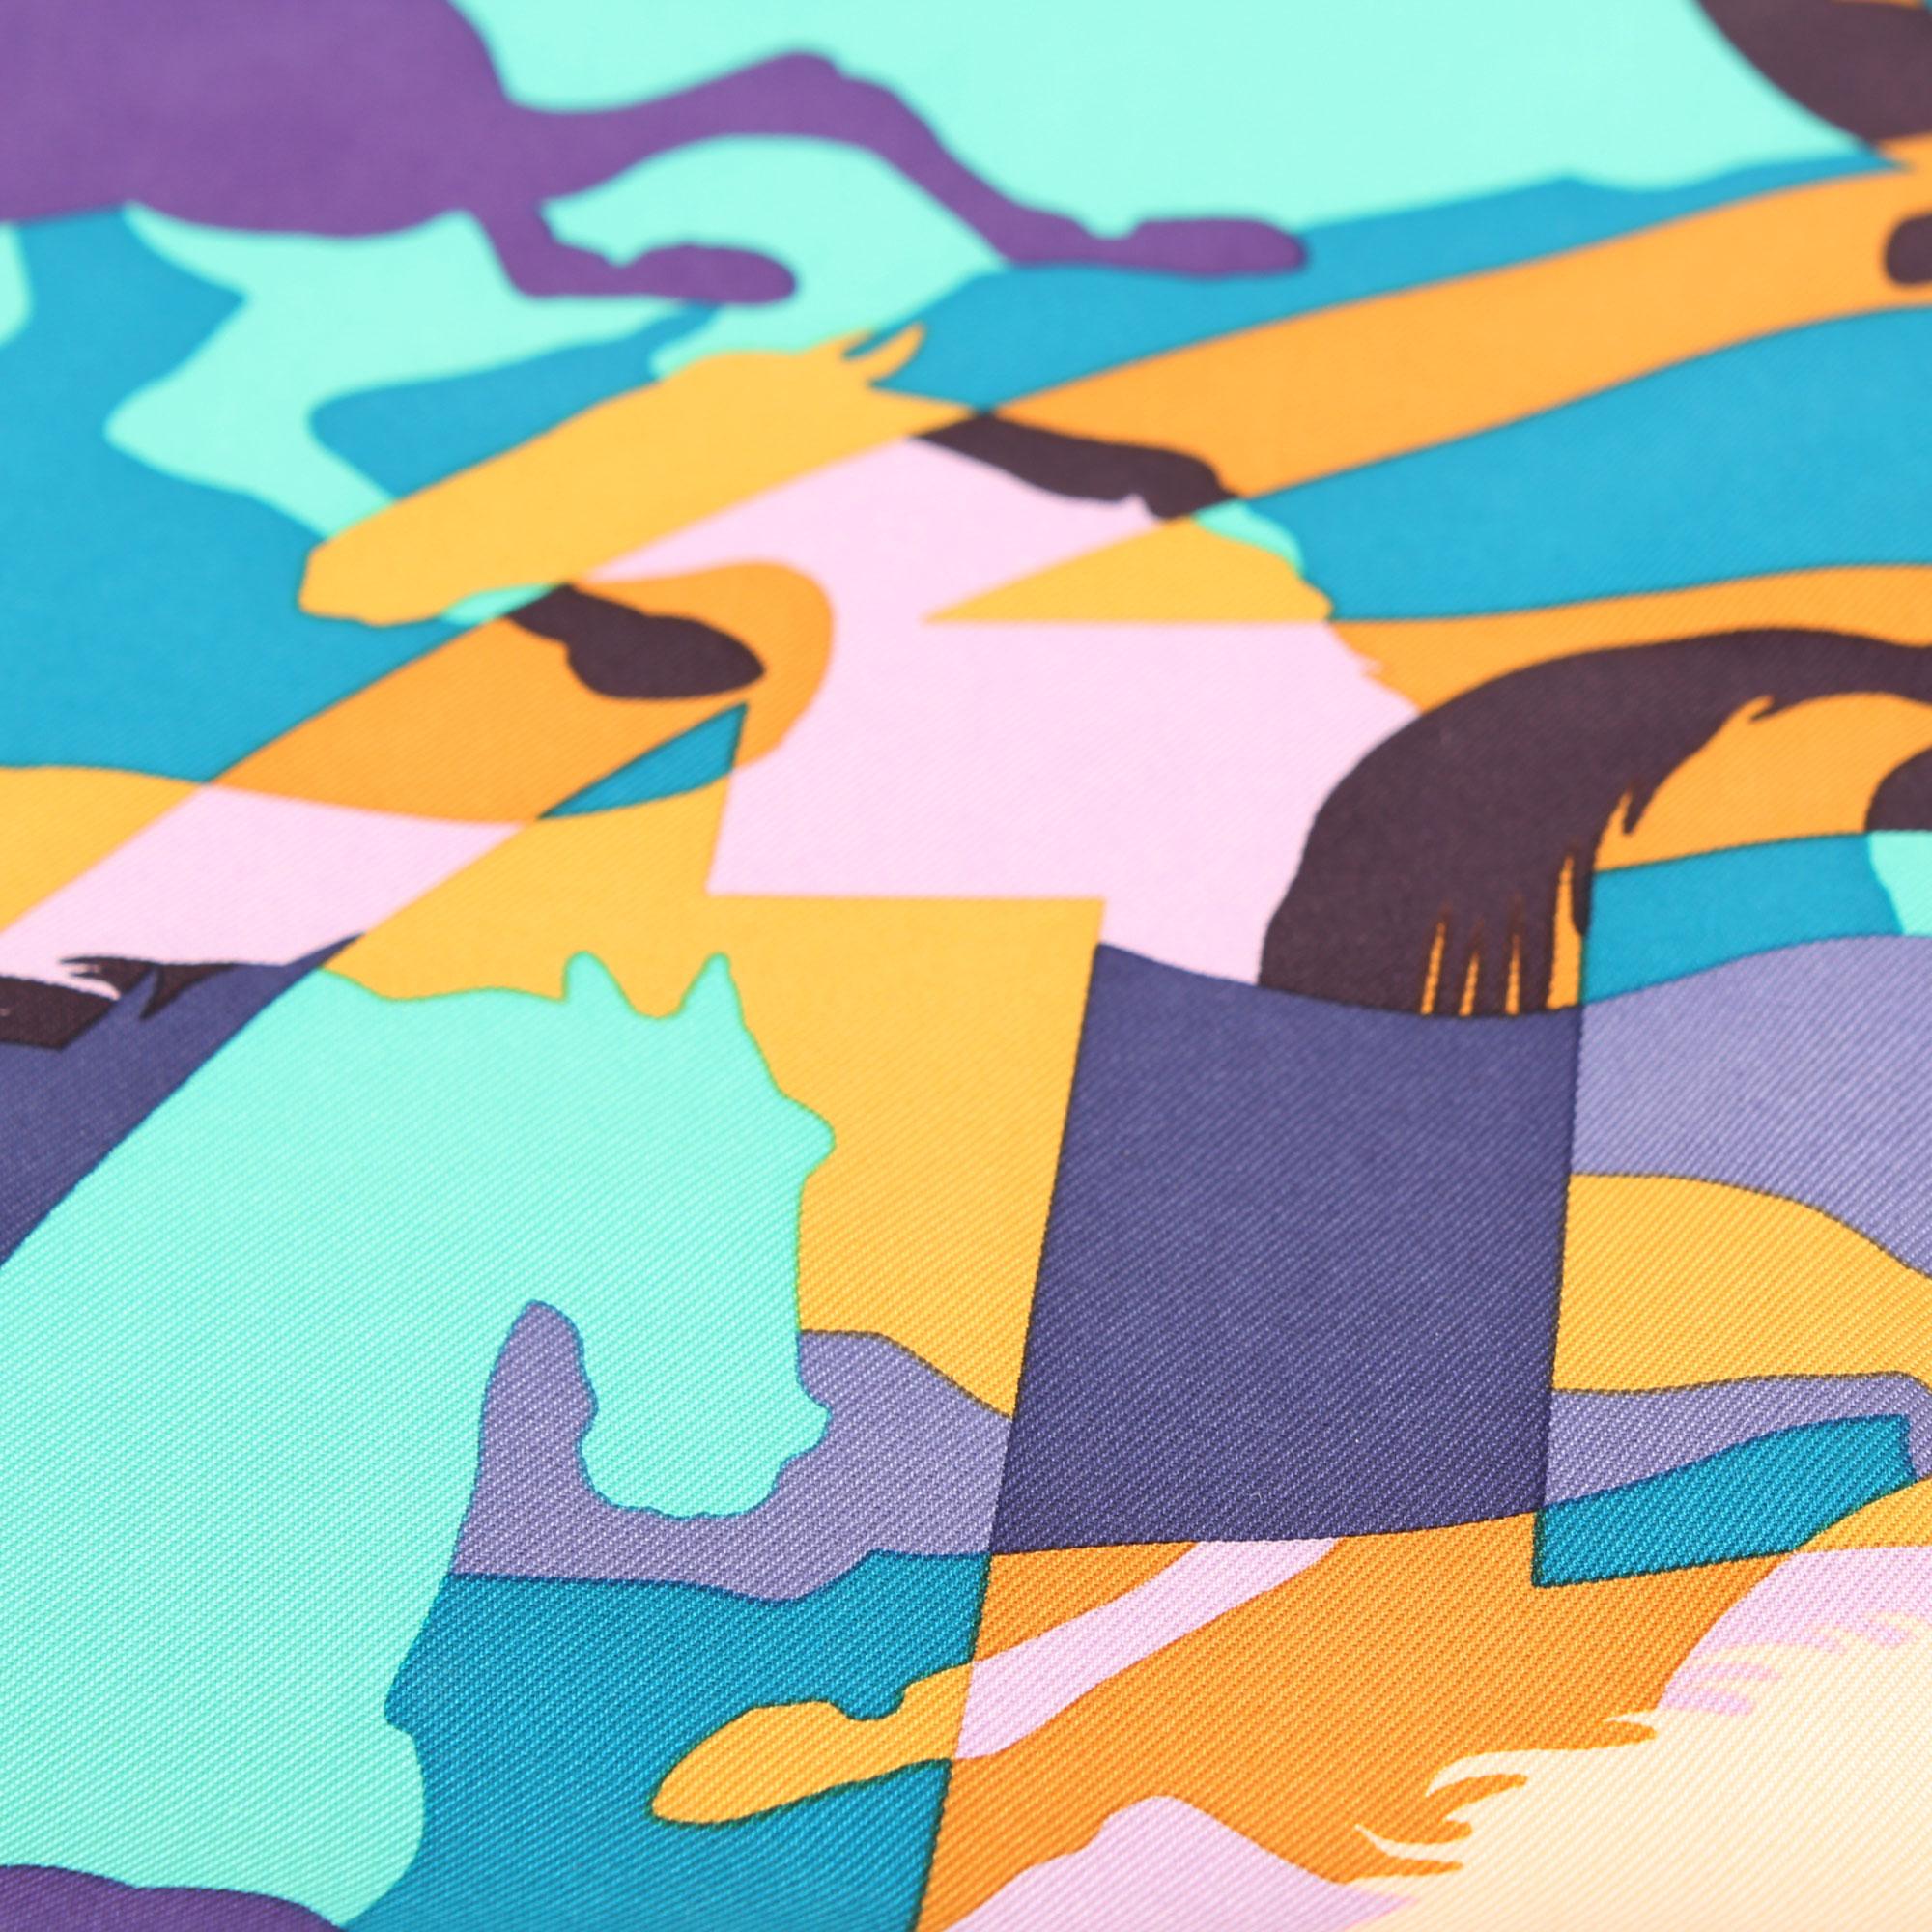 imagen de detalle del hermes carre ex libris en camouflage